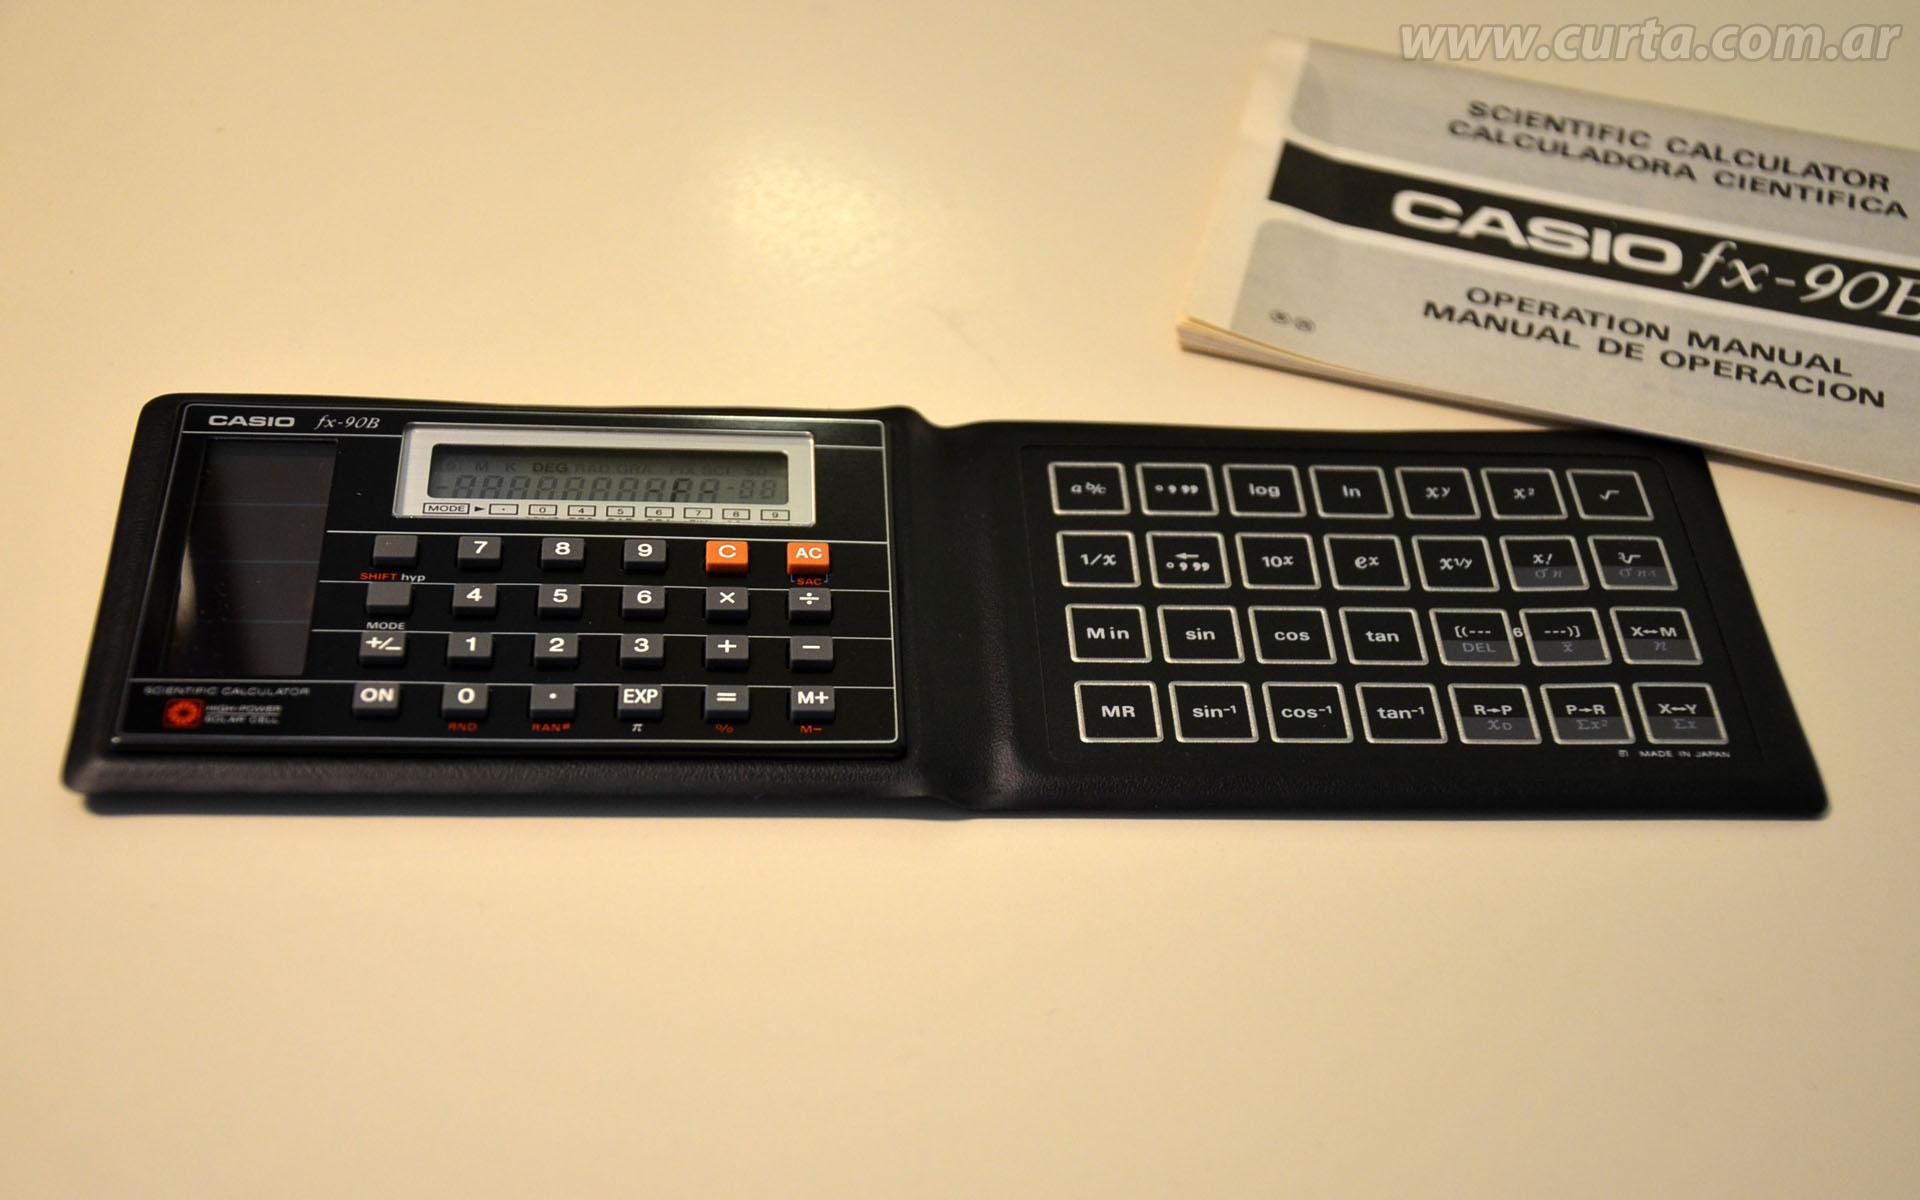 casio fx 82tl user manual